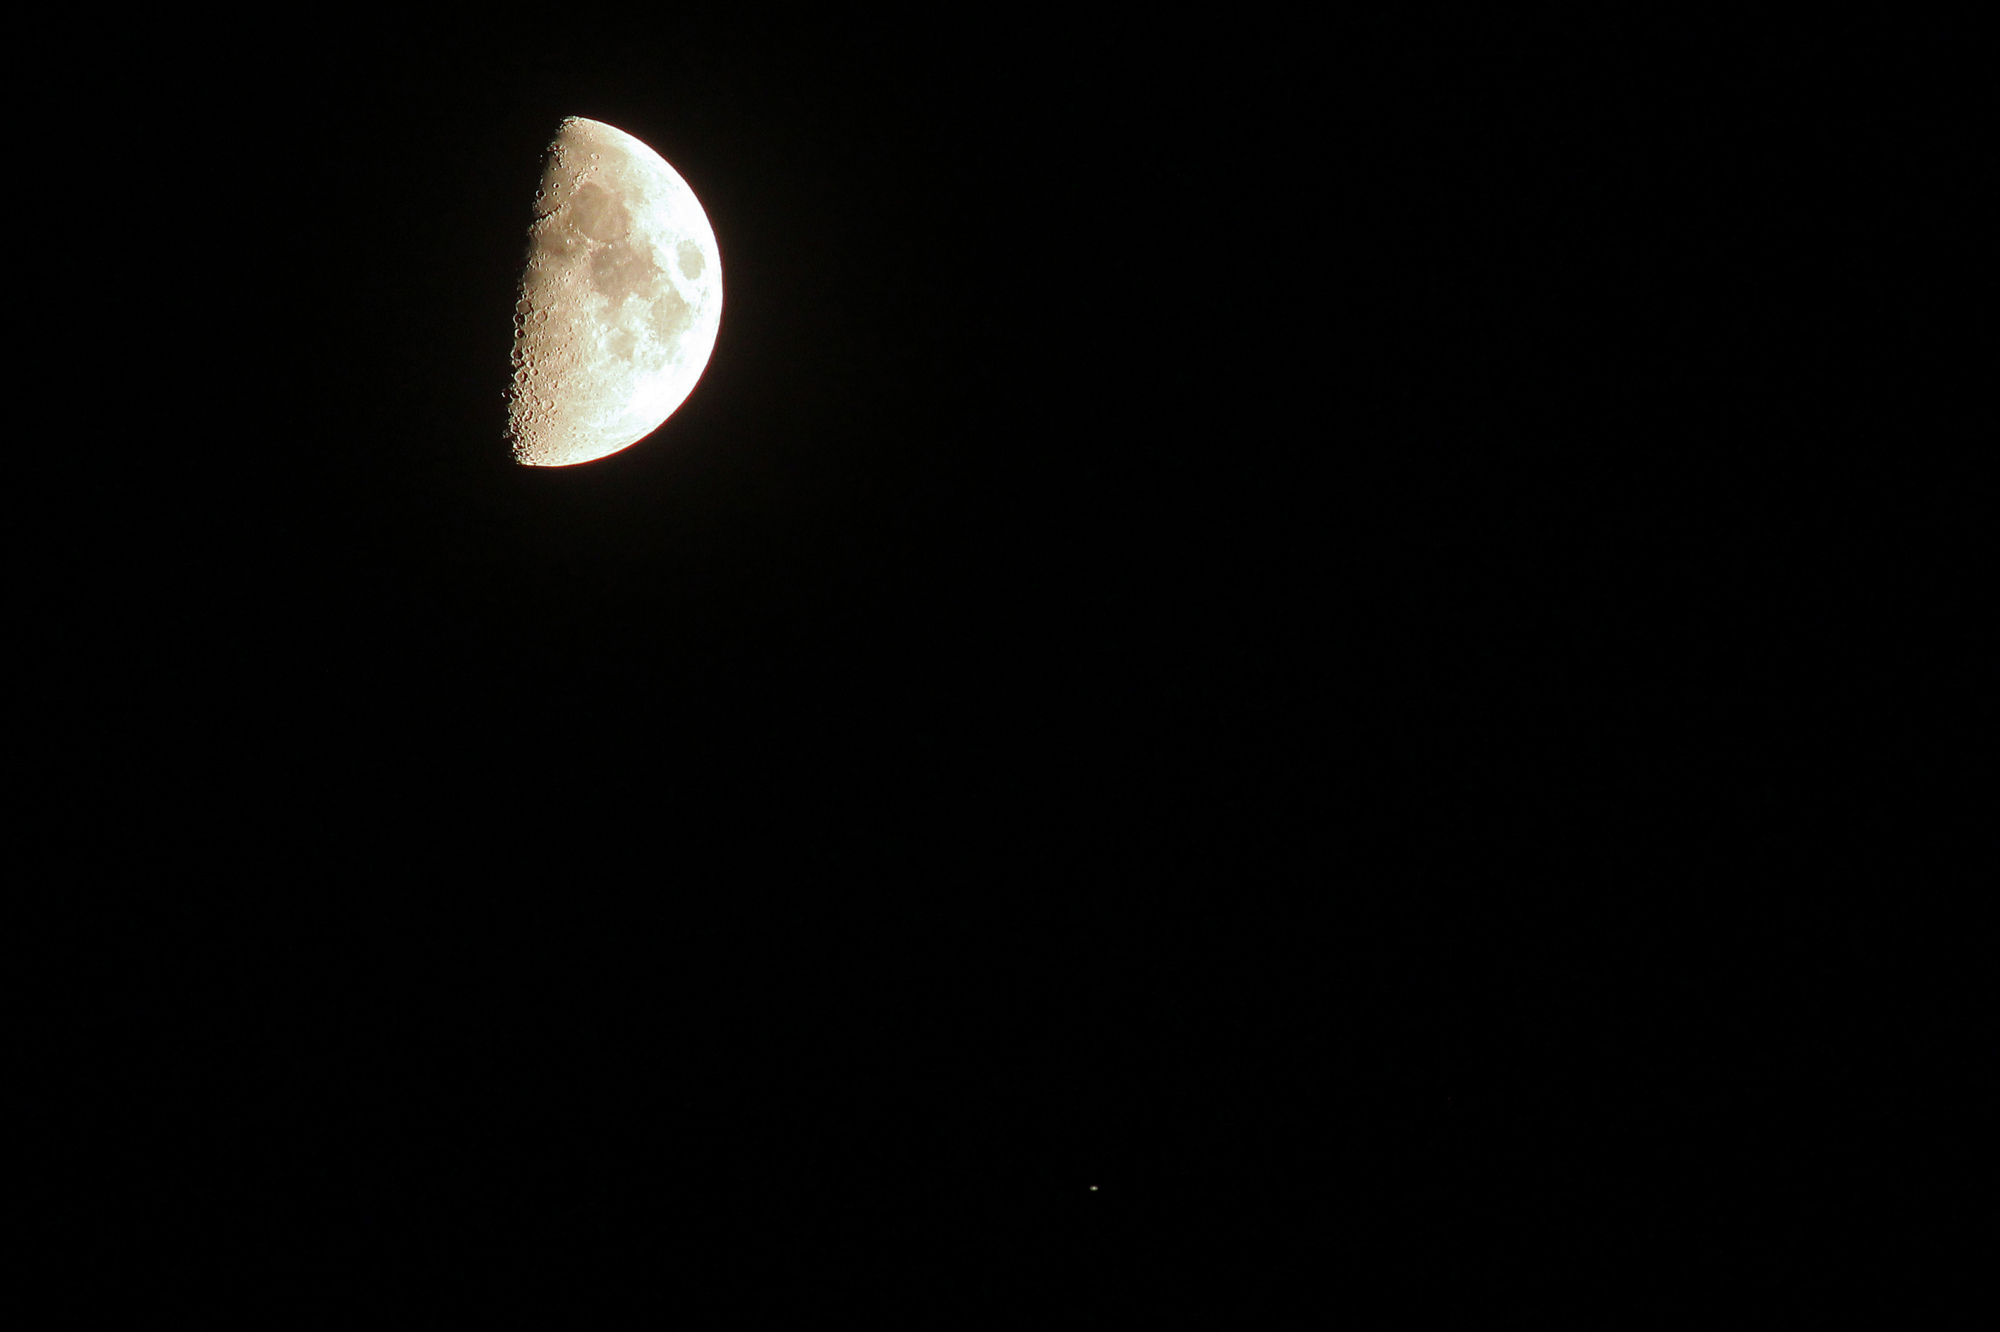 5ba00e516f765_lune-saturne300mmrd.thumb.jpg.49ec2191d1937ed4aec0d27c4c07f3e1.jpg